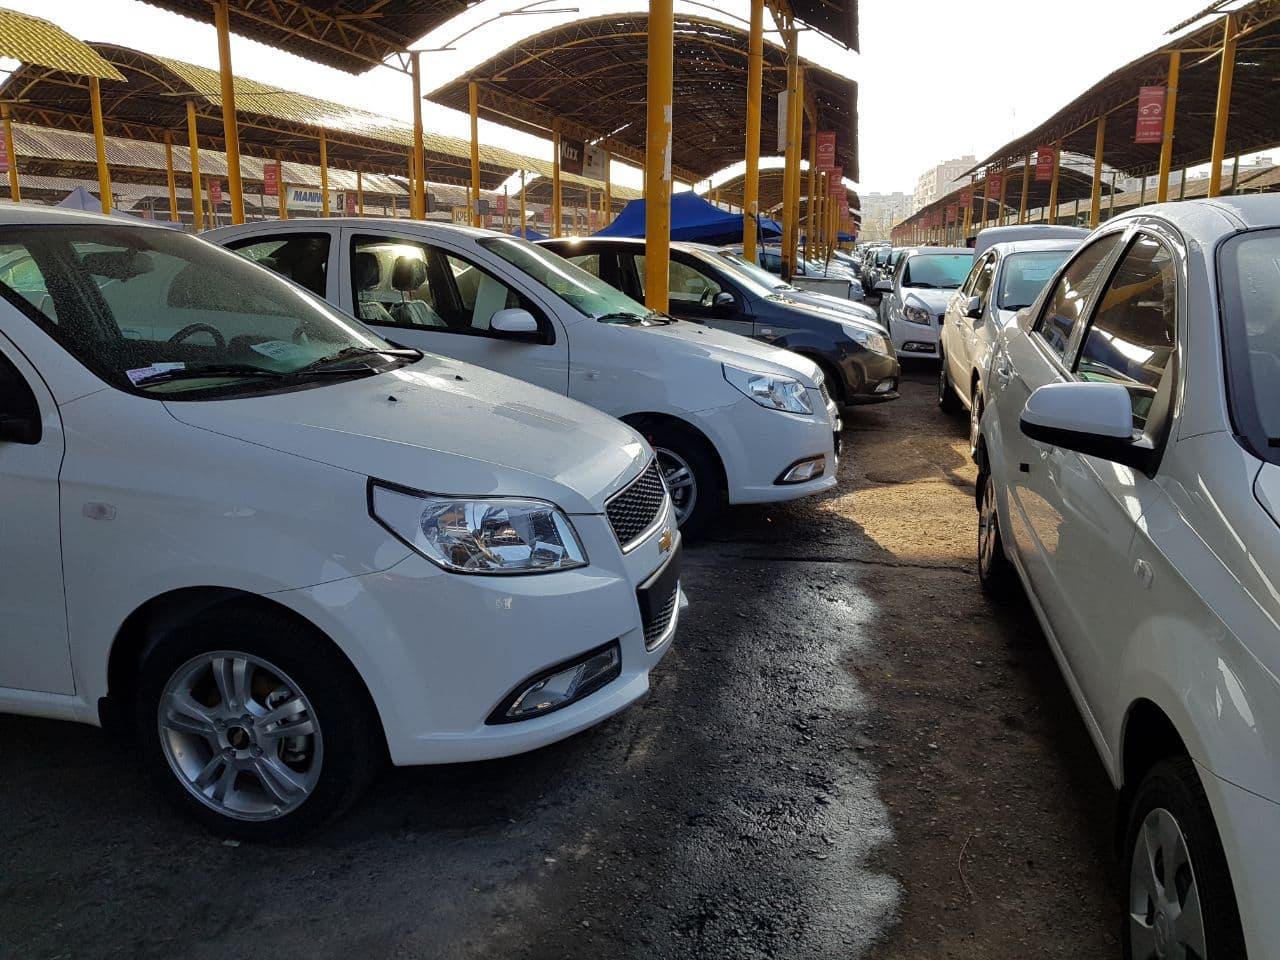 Автомобили на рынке Сергели авто базар в Ташкенте